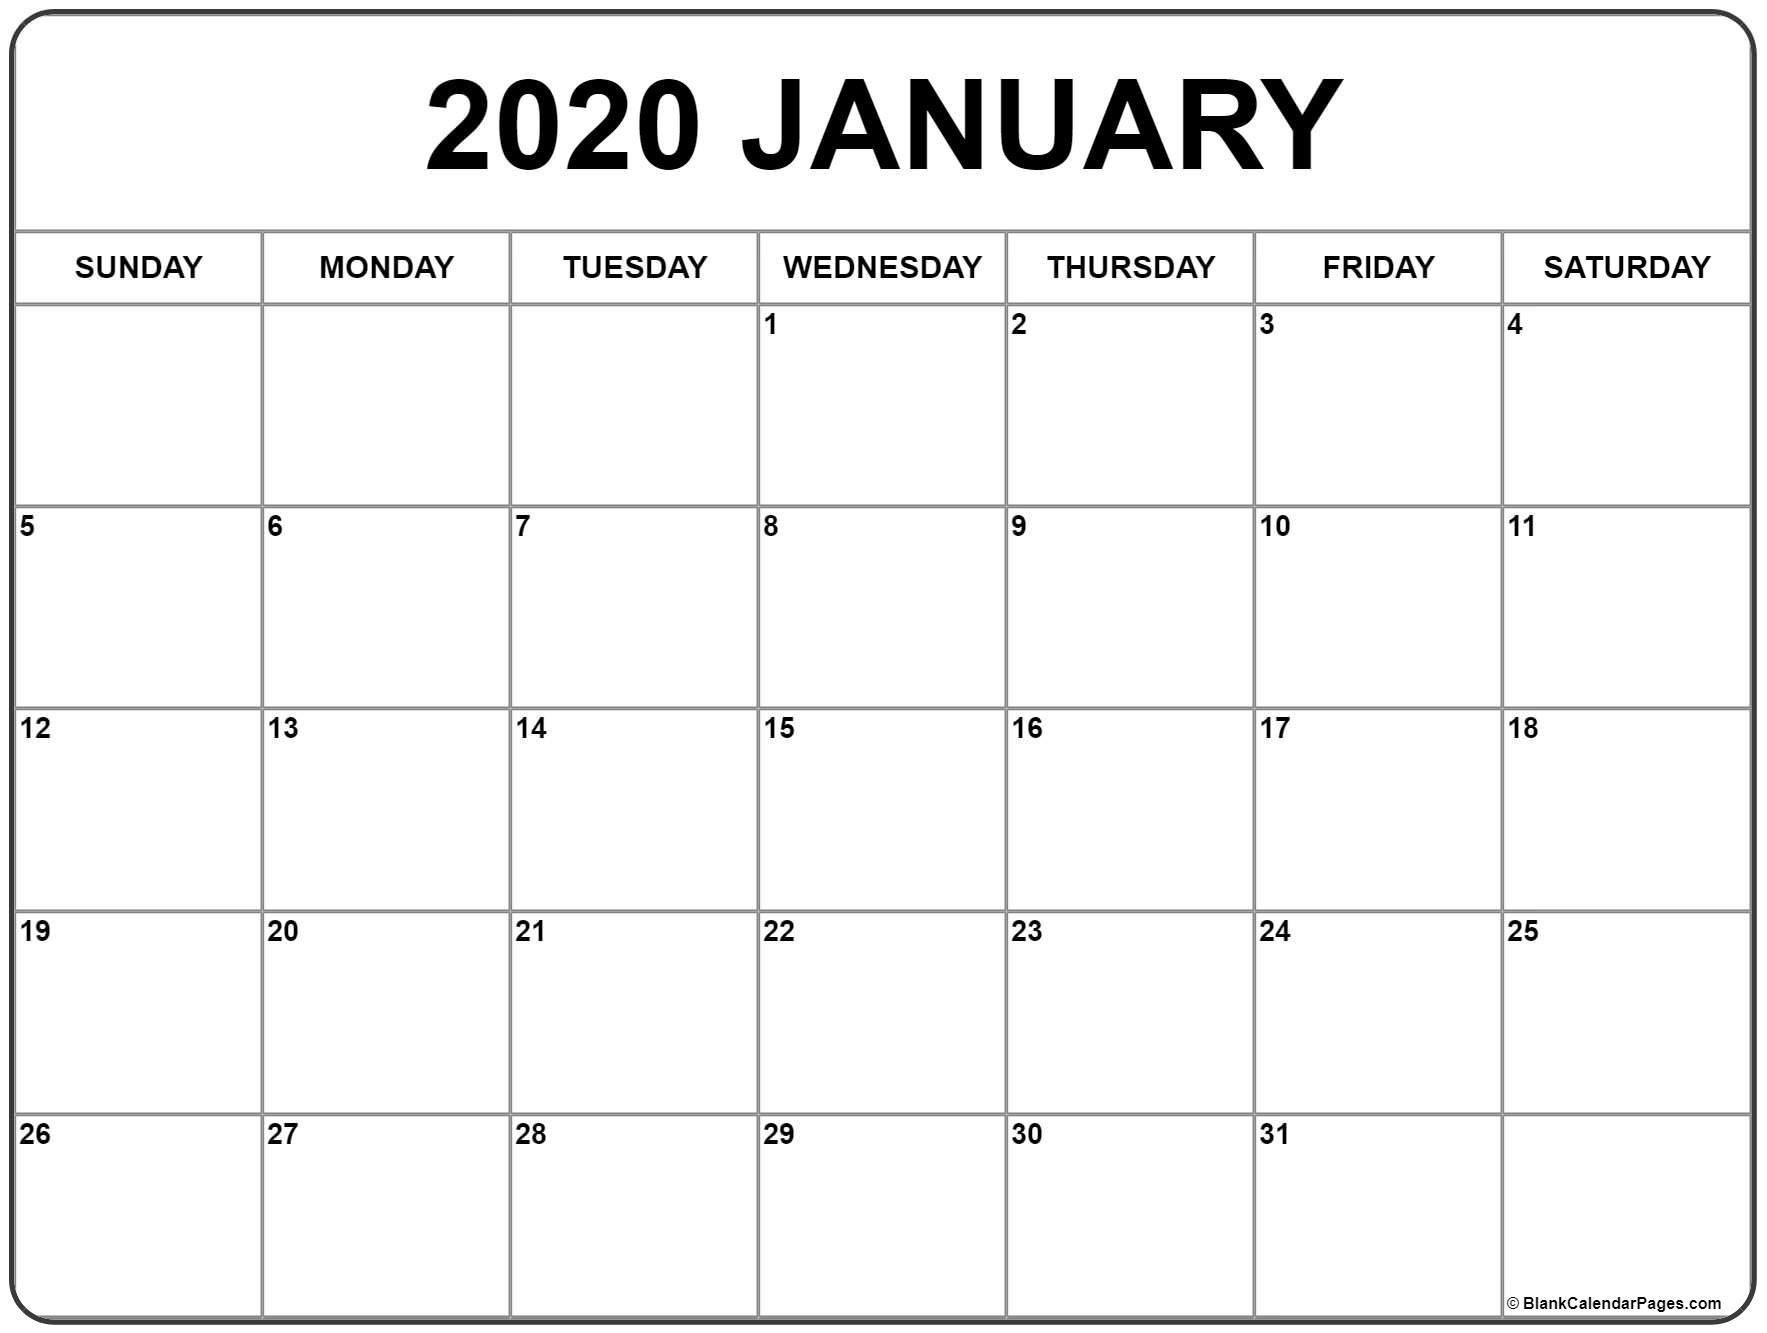 January 2020 Calendar | Free Printable Monthly Calendars-January 2020 Calendar Print